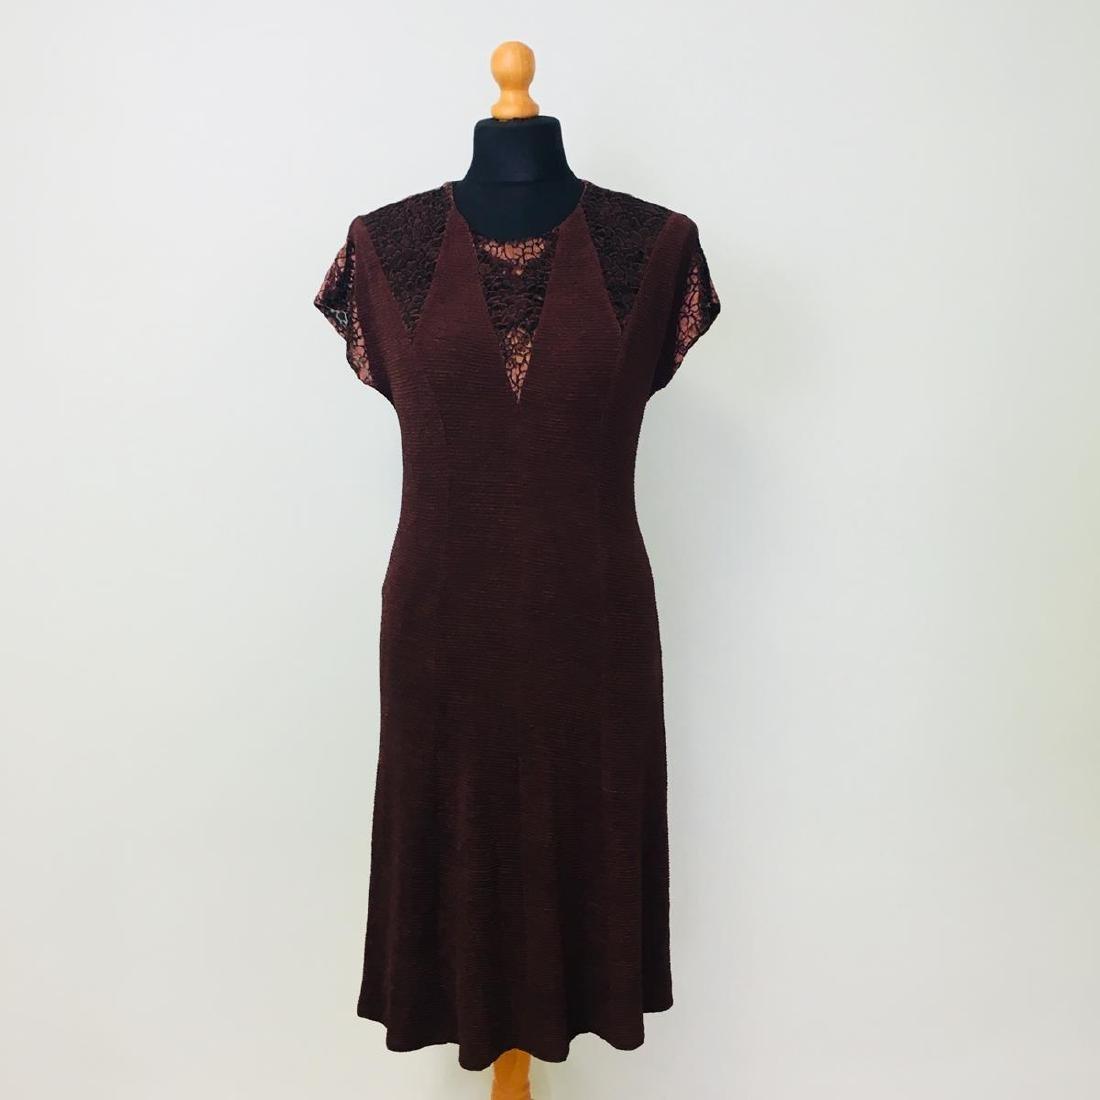 Vintage Women's 2 Piece Evening Jacket Dress Size M - 5